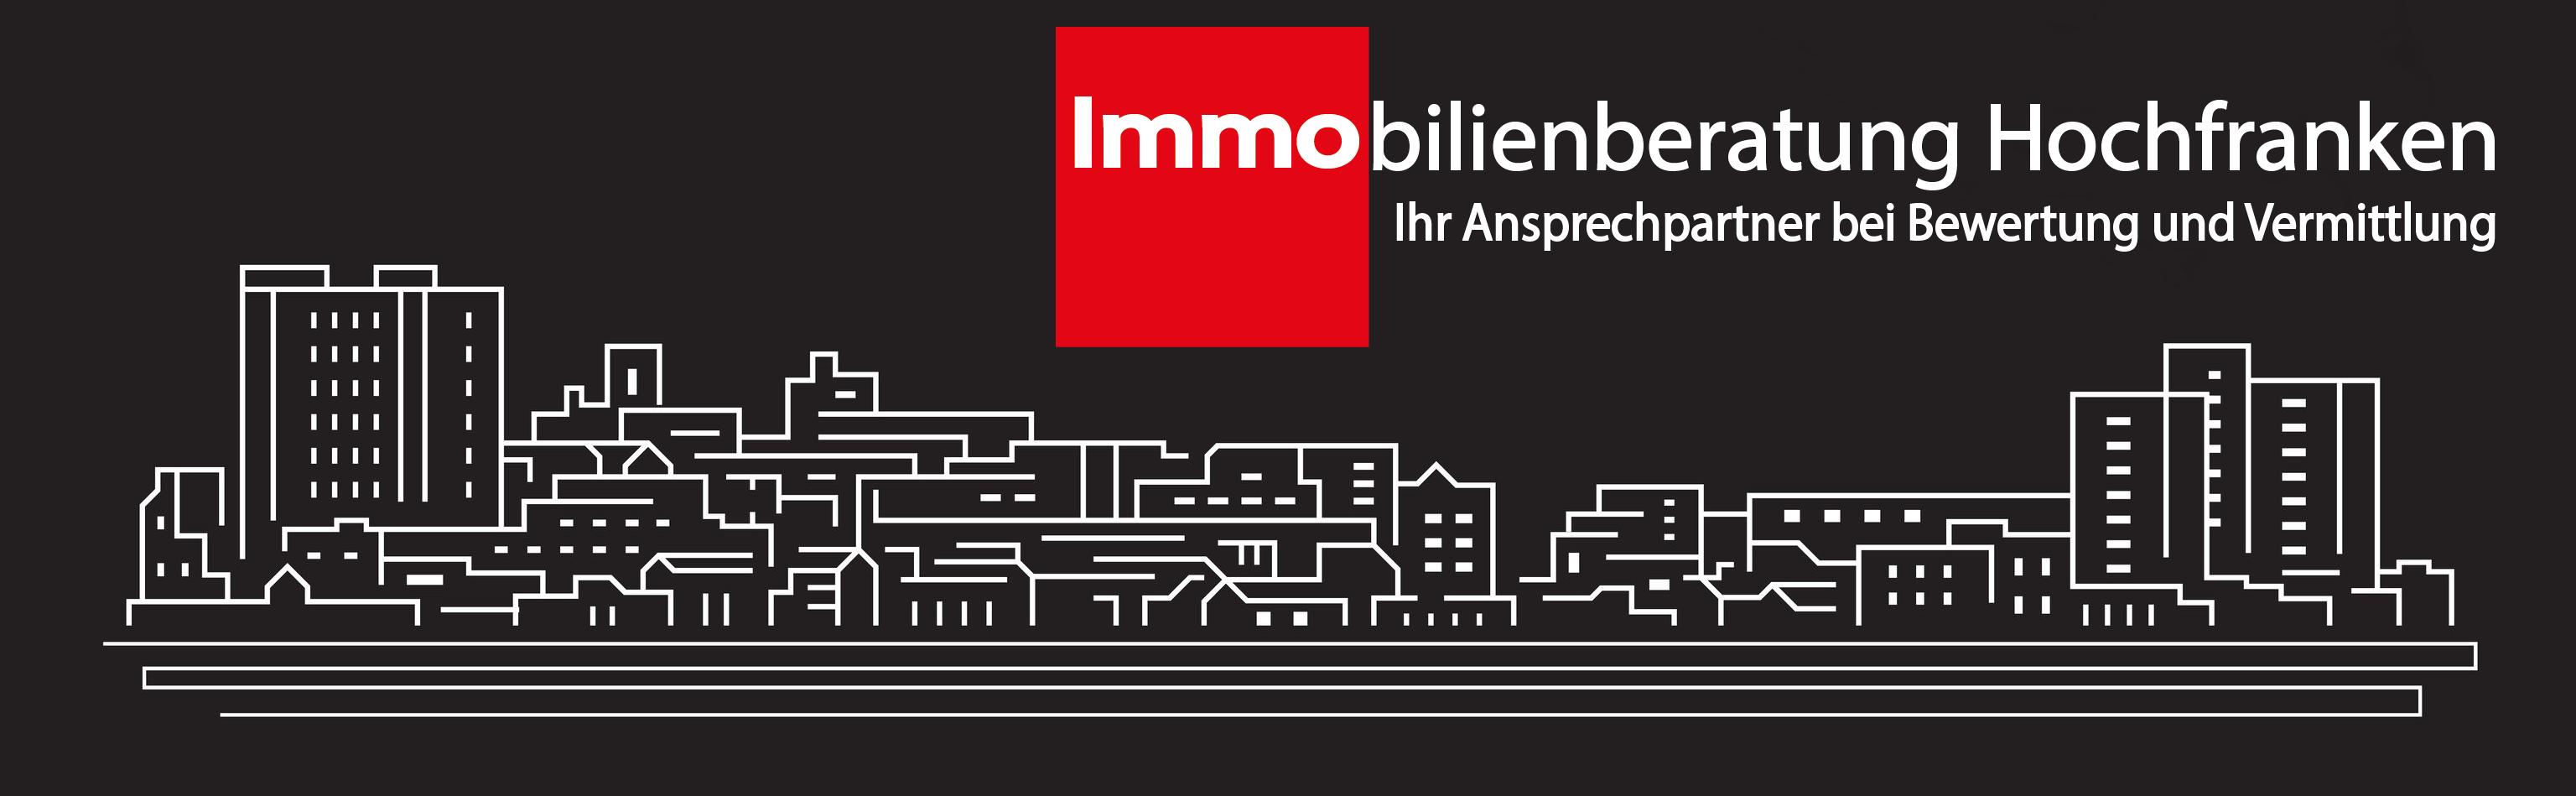 Immobilienberatung Hochfranken